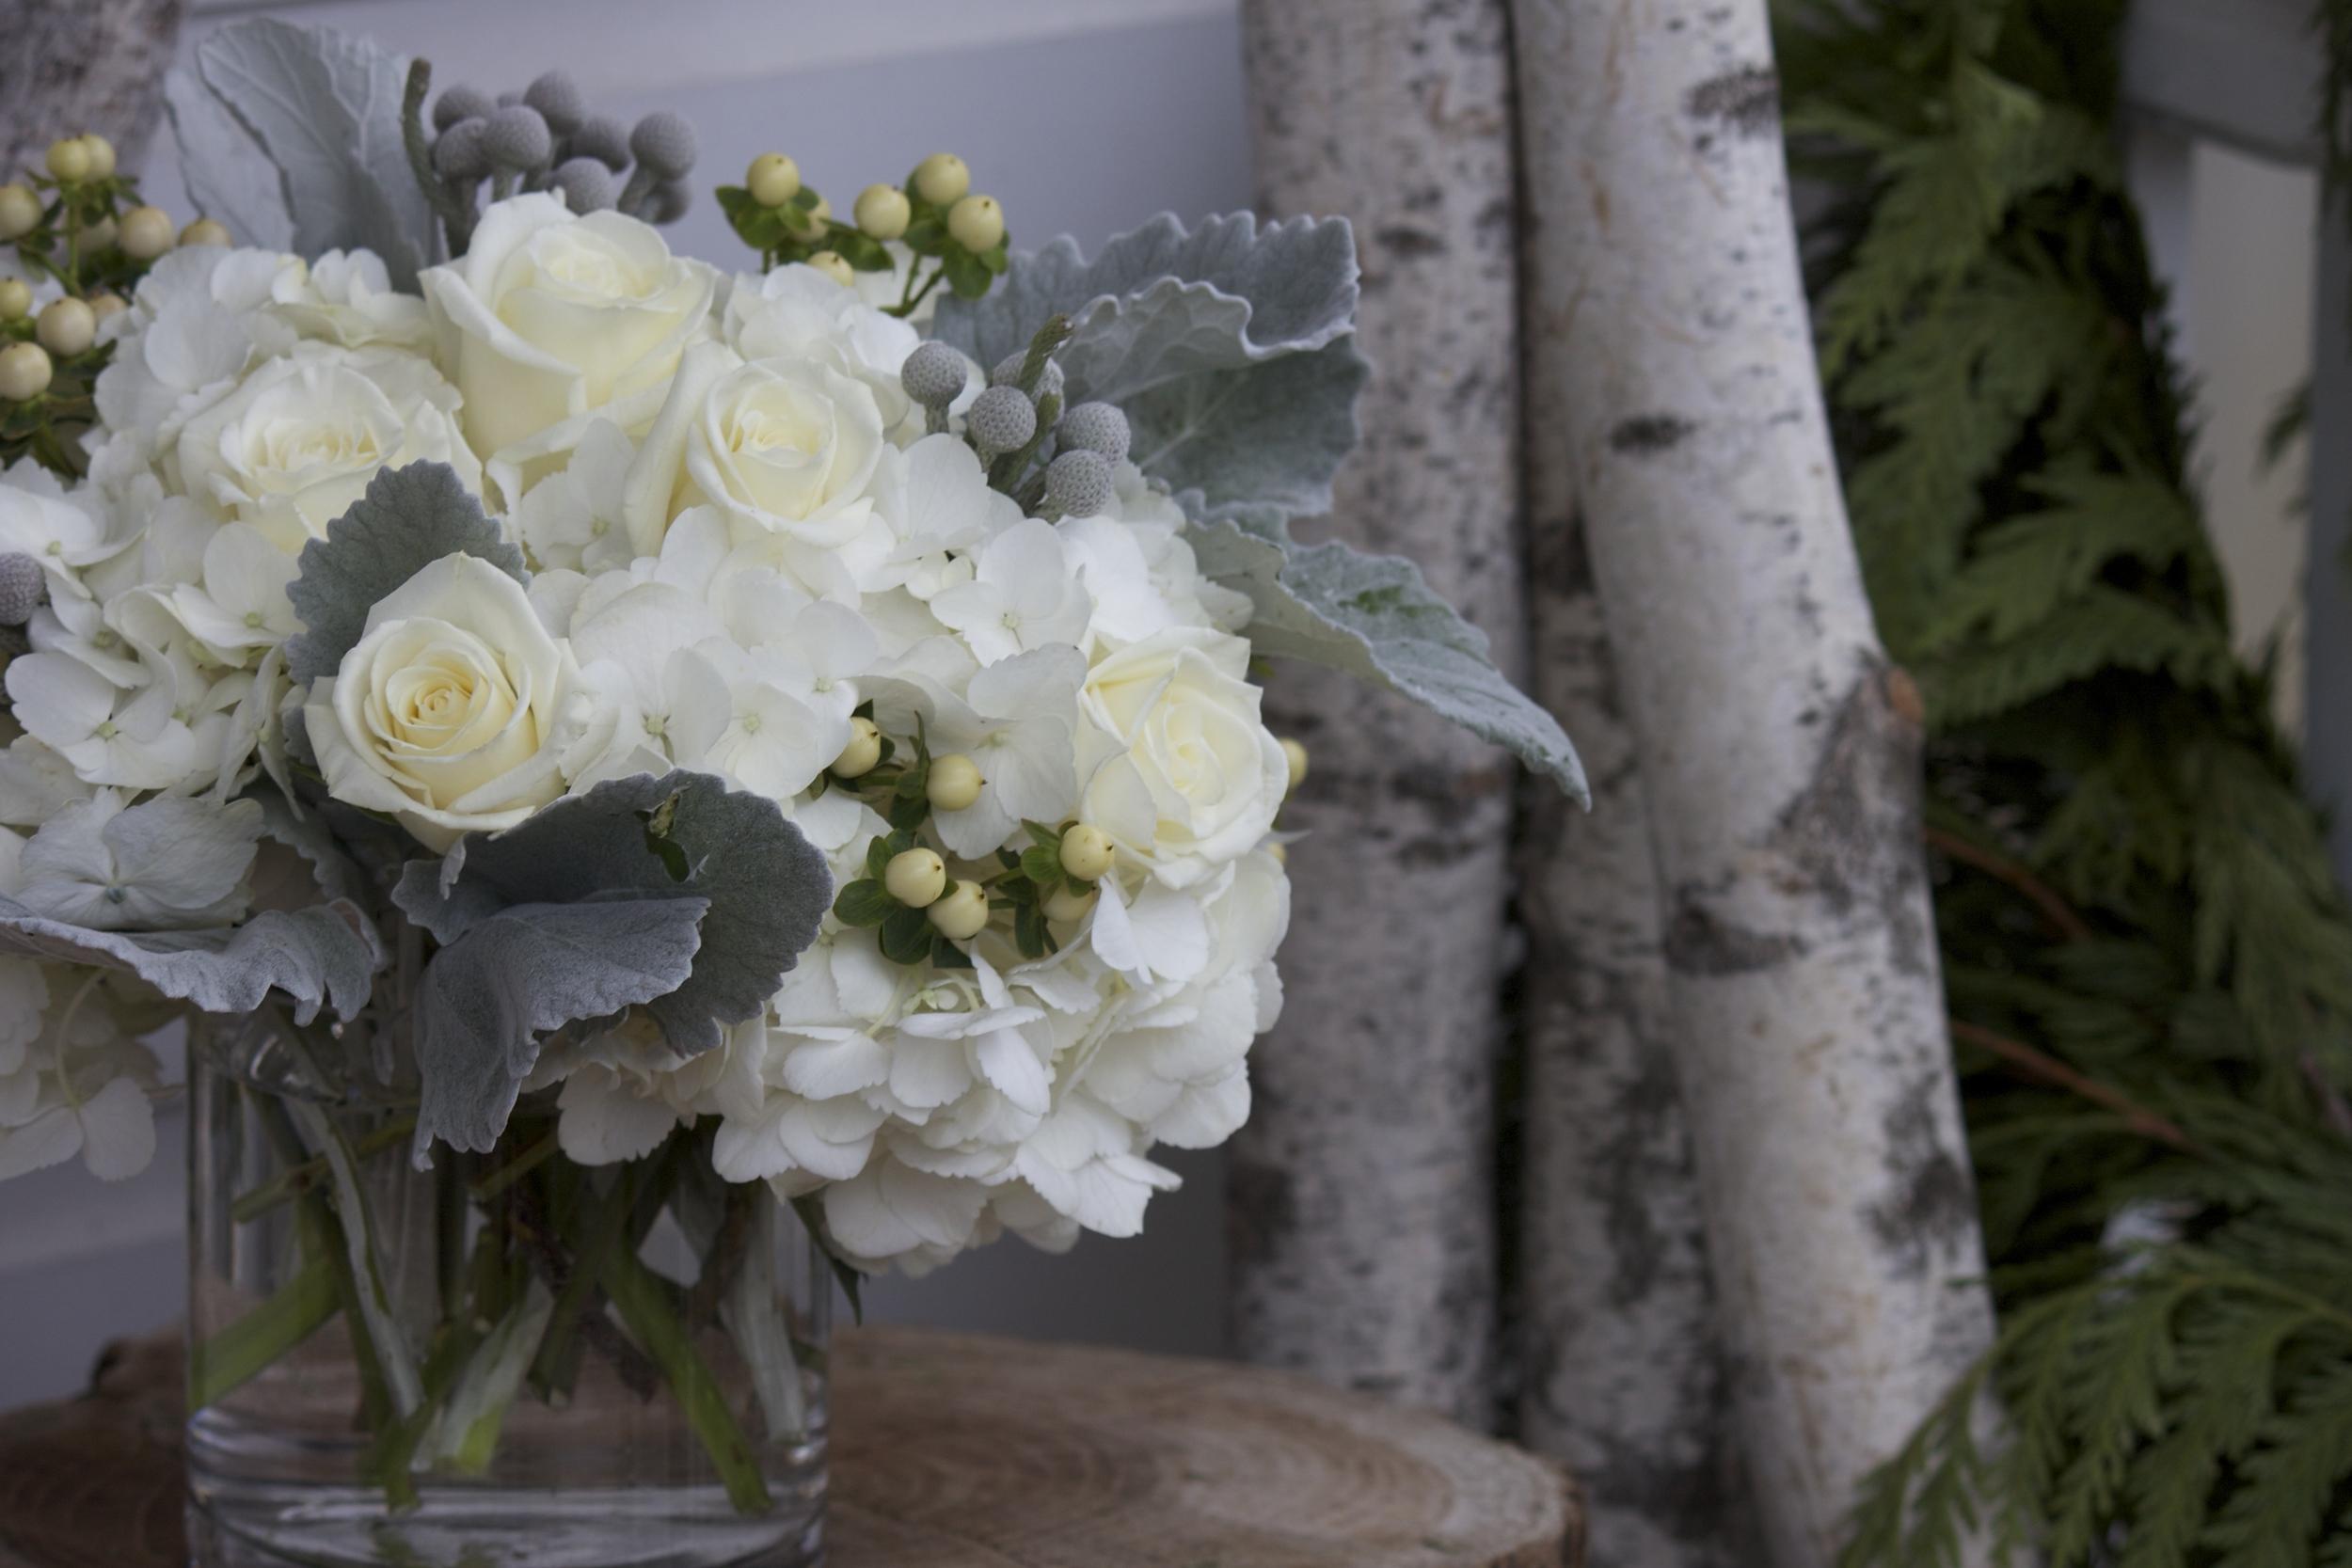 Brunia berries (gray), white Hypericum berries, white hydrangea, Dusty Miller (gray leaves), white roses